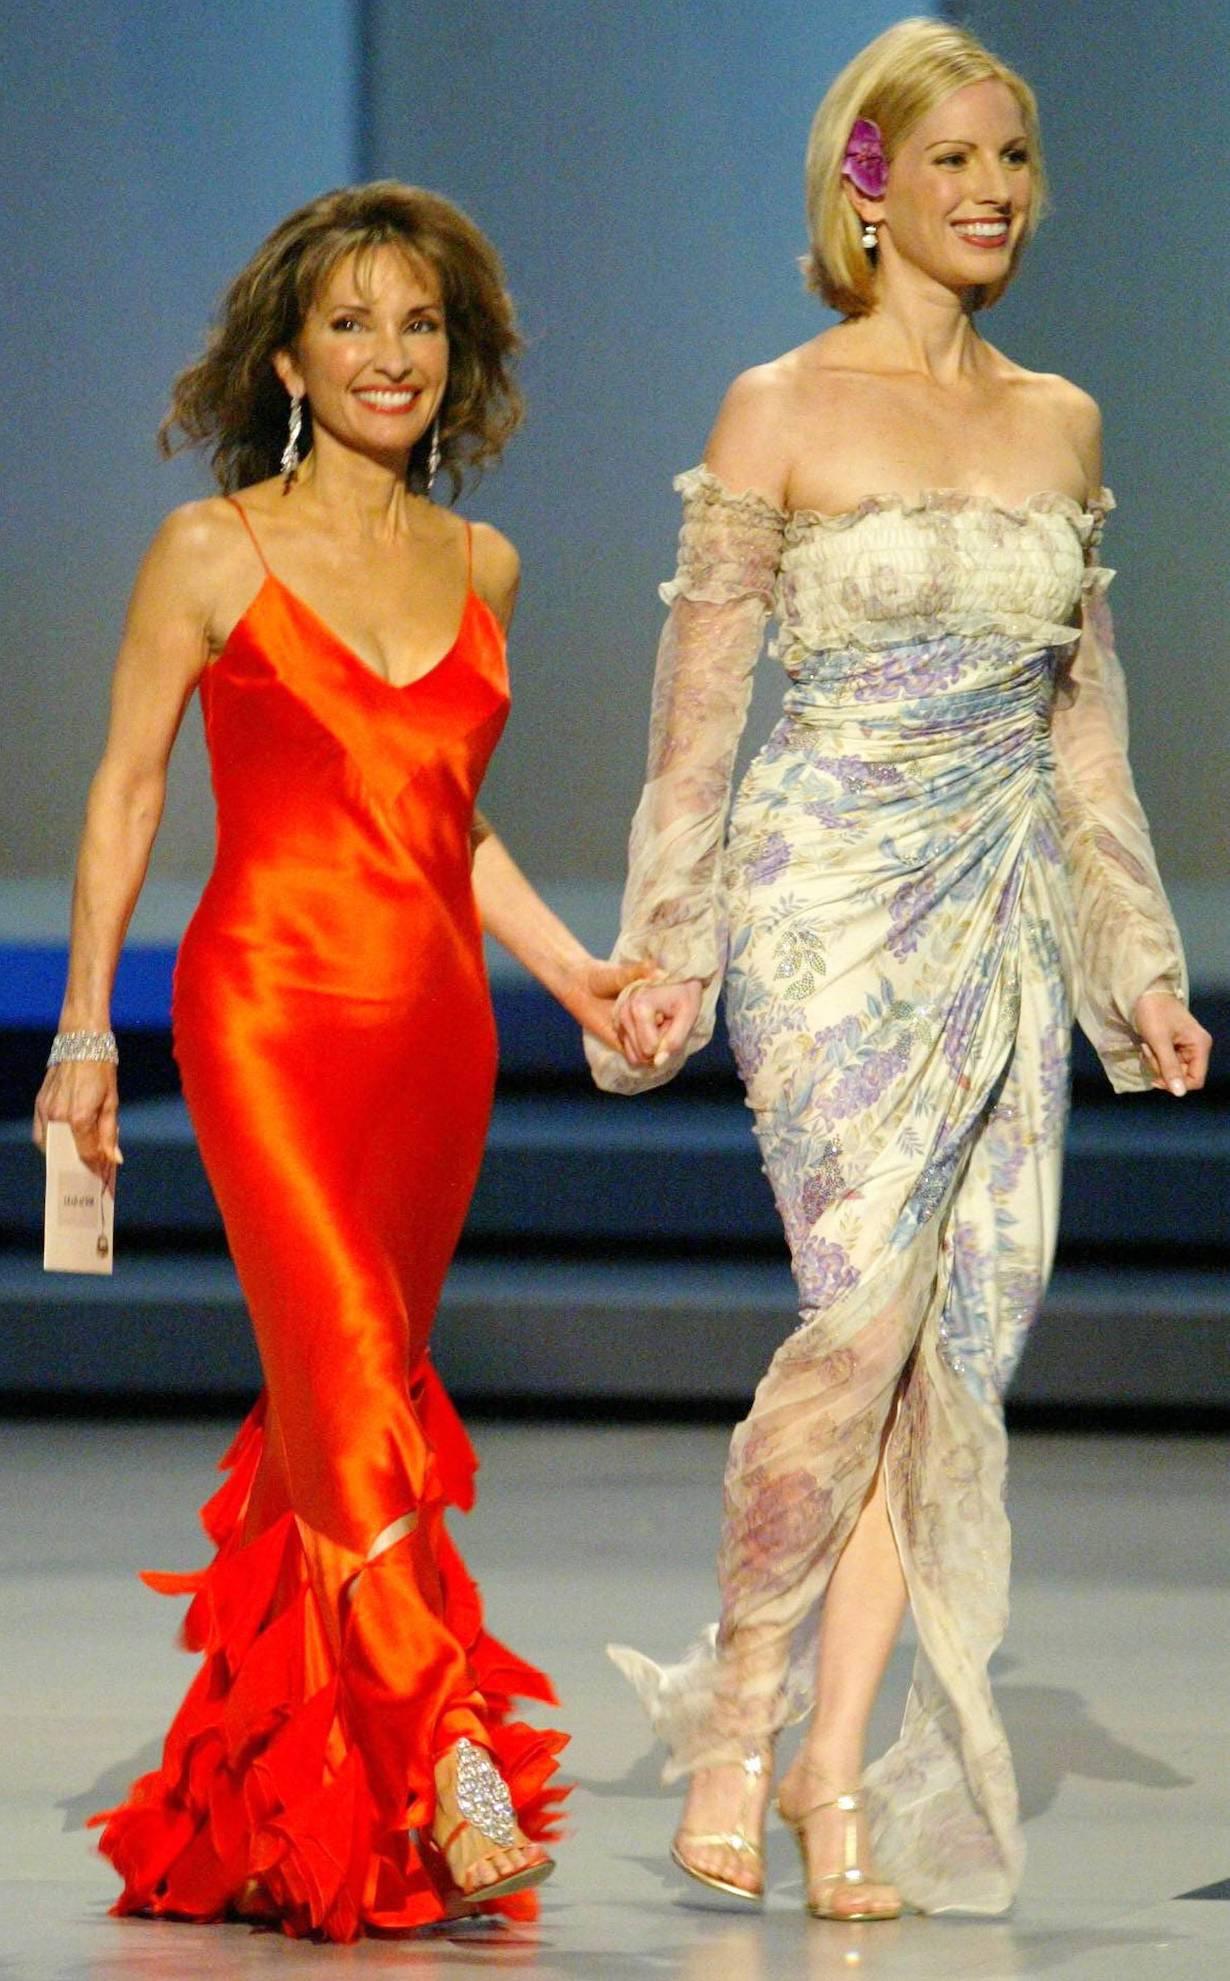 Susan Lucci and Liza Huber 31st Annual Daytime Emmy Awards Radio City Music Hall New York 5/21/04 ©John Paschal/jpistudios.com 310-657-9661